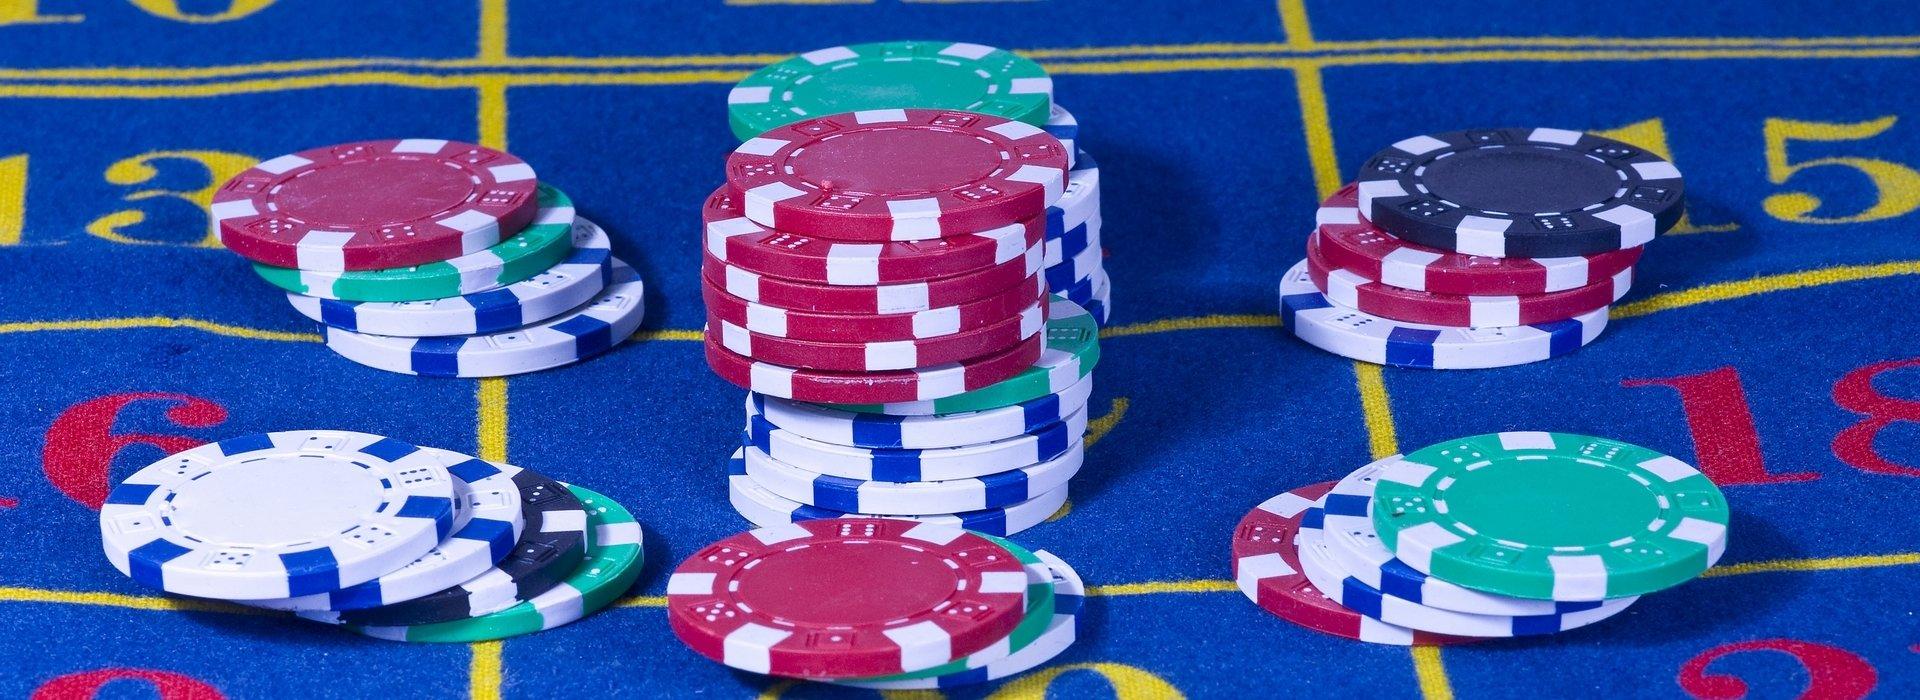 Casinos in Budapest – Budapest Casino Guide